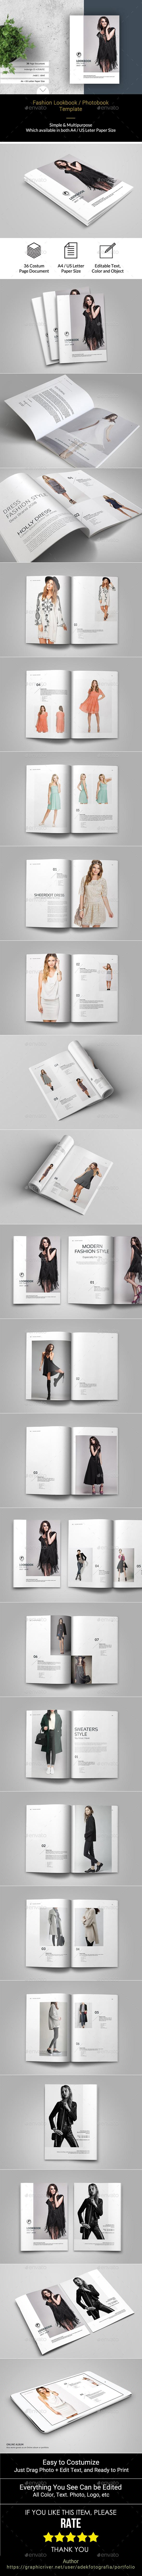 GraphicRiver Lookbook Photobook 21155343